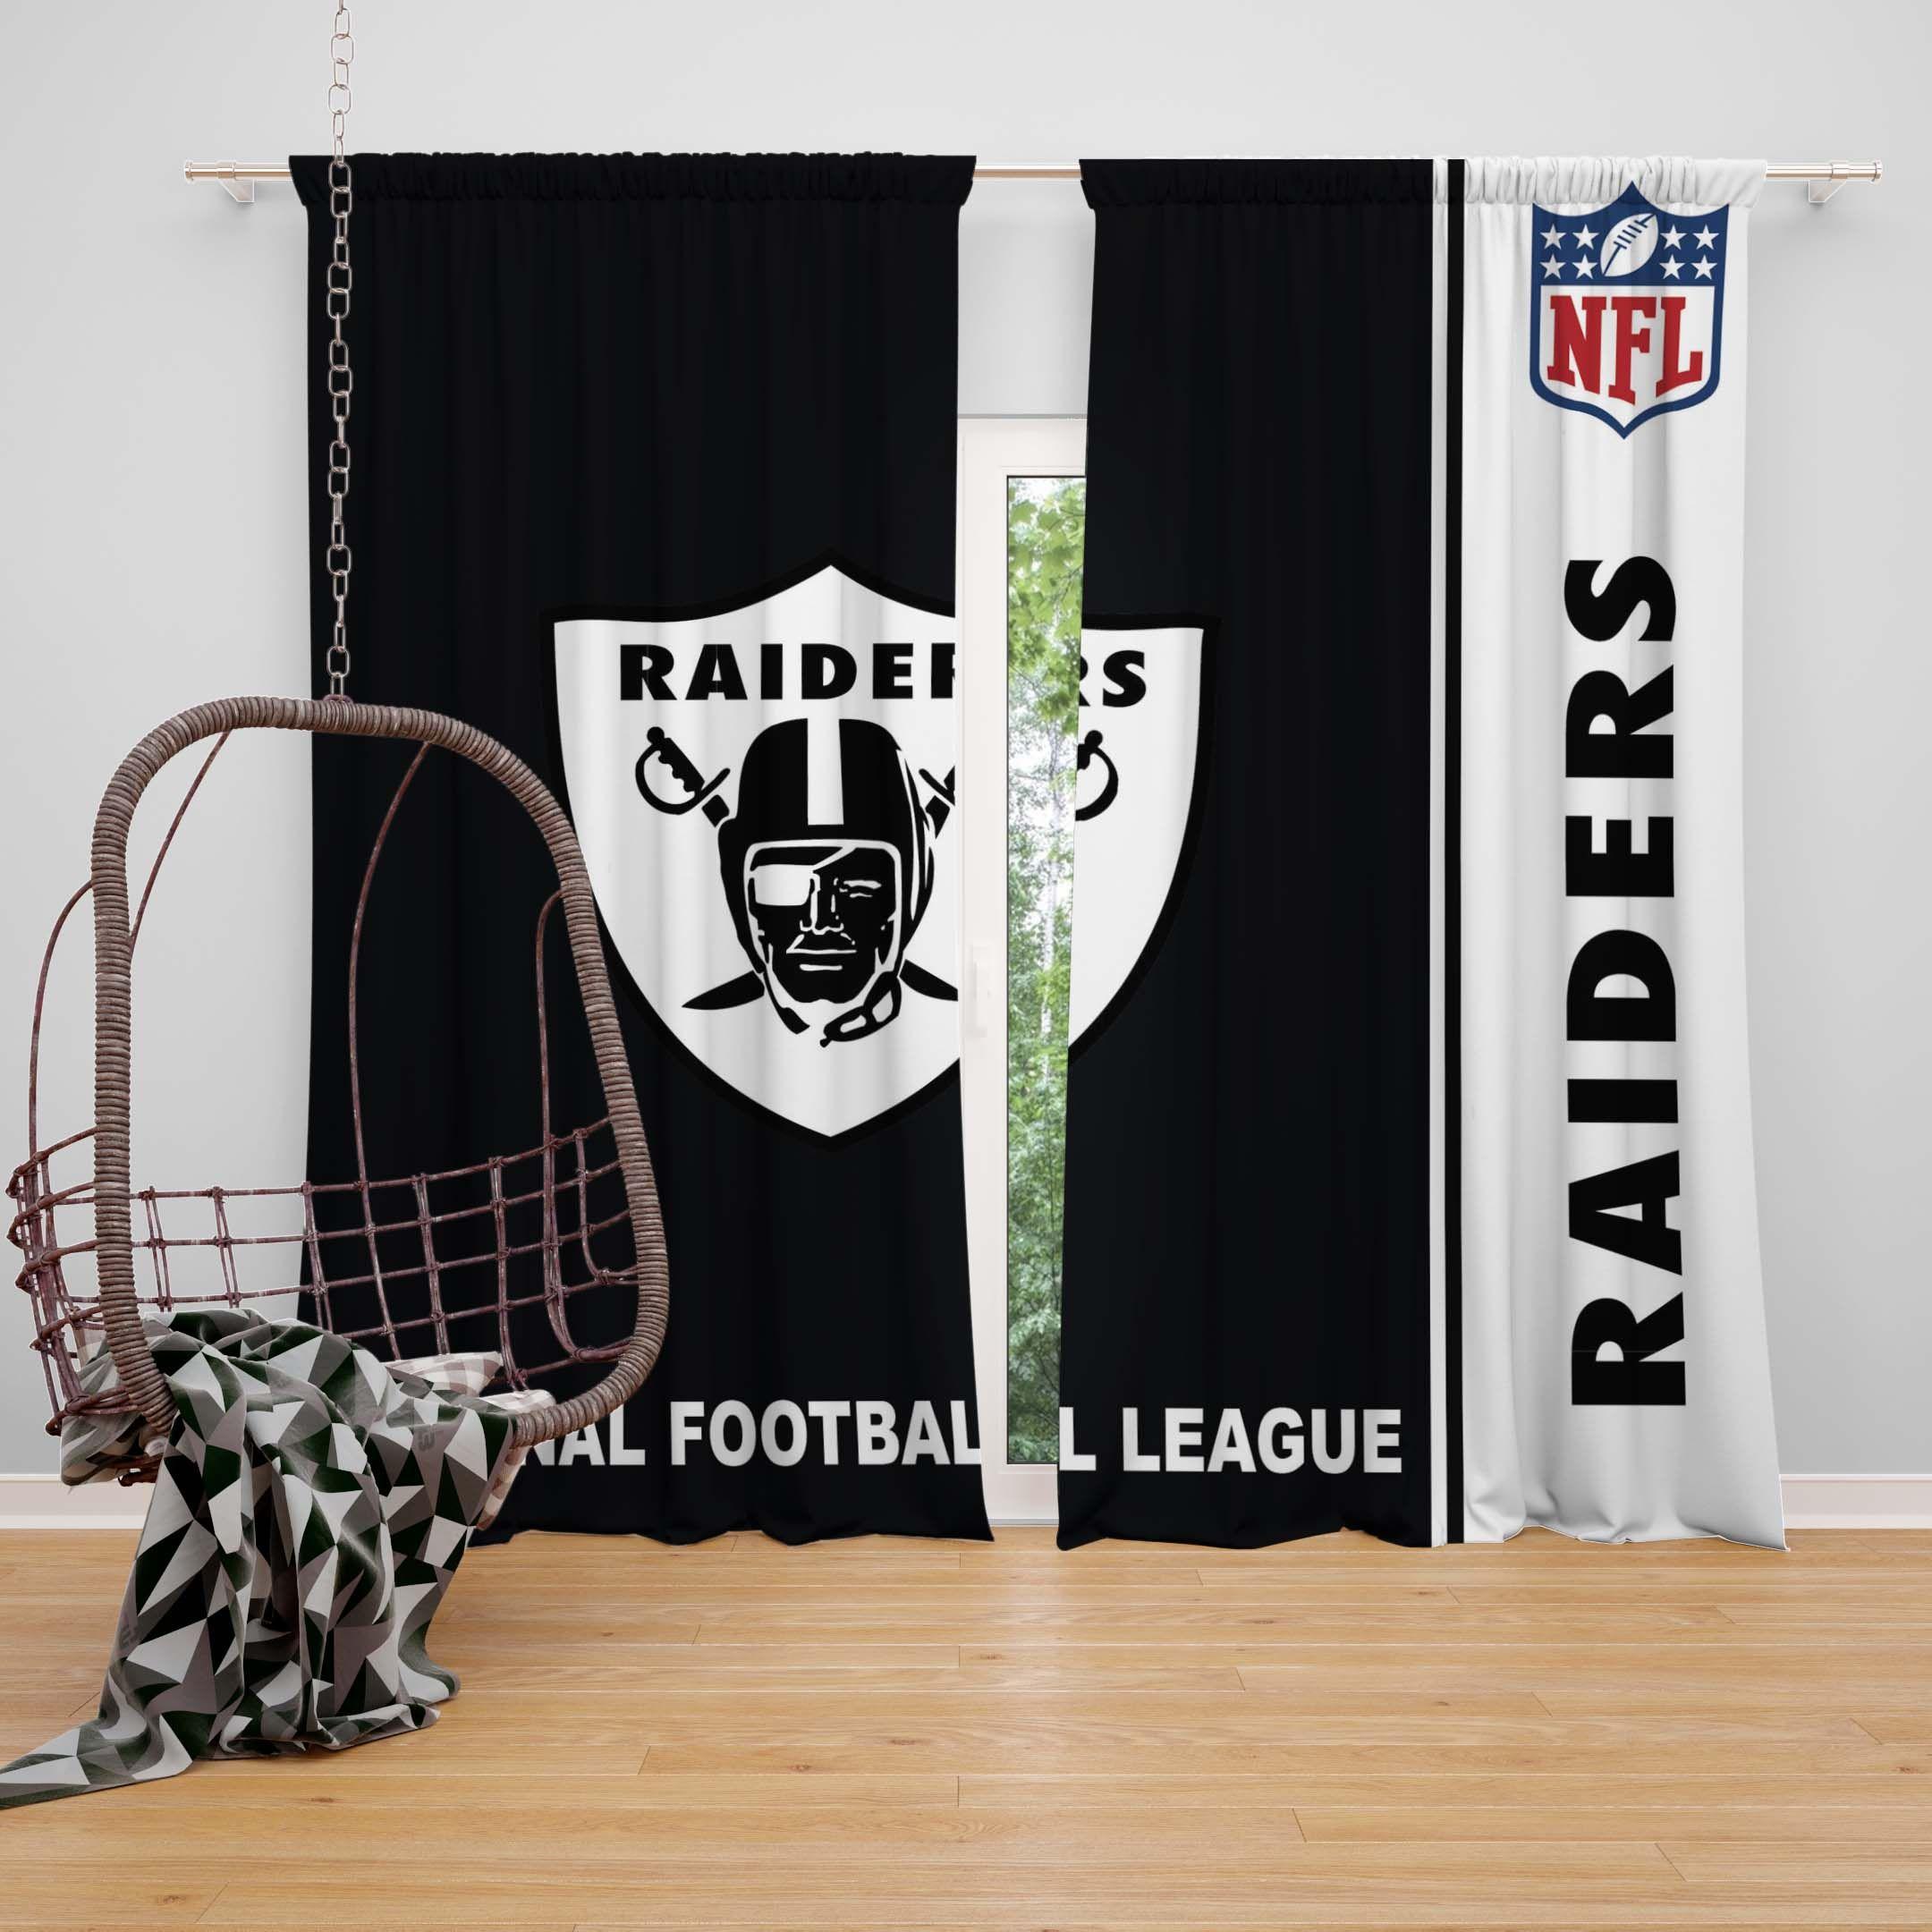 Nfl Oakland Raiders Bedroom Curtain Ebeddingsets Nfl Oakland